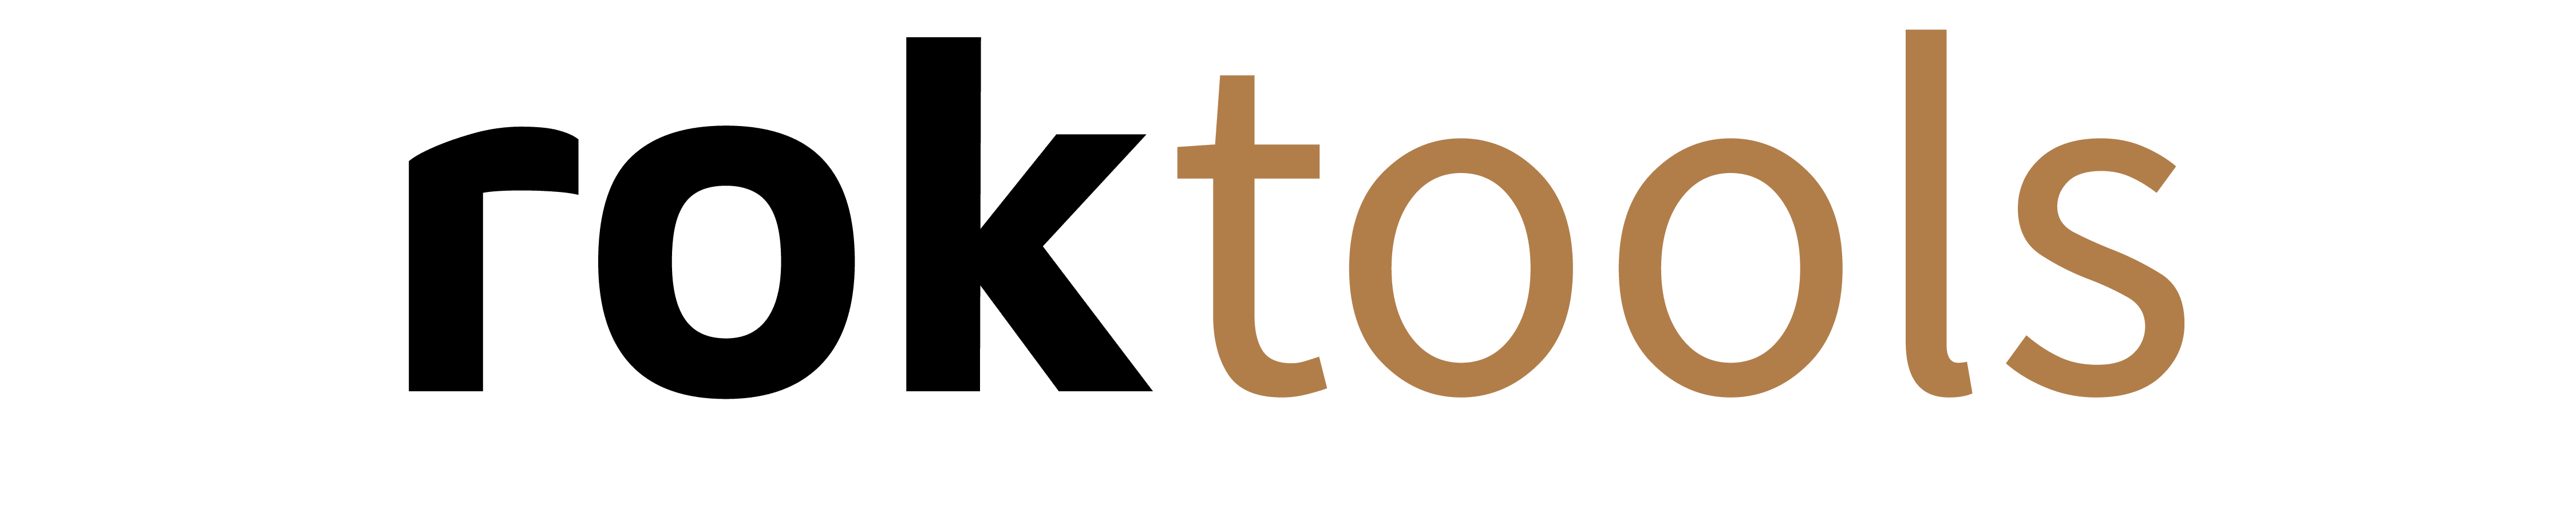 LOGO-ROKTOOLS